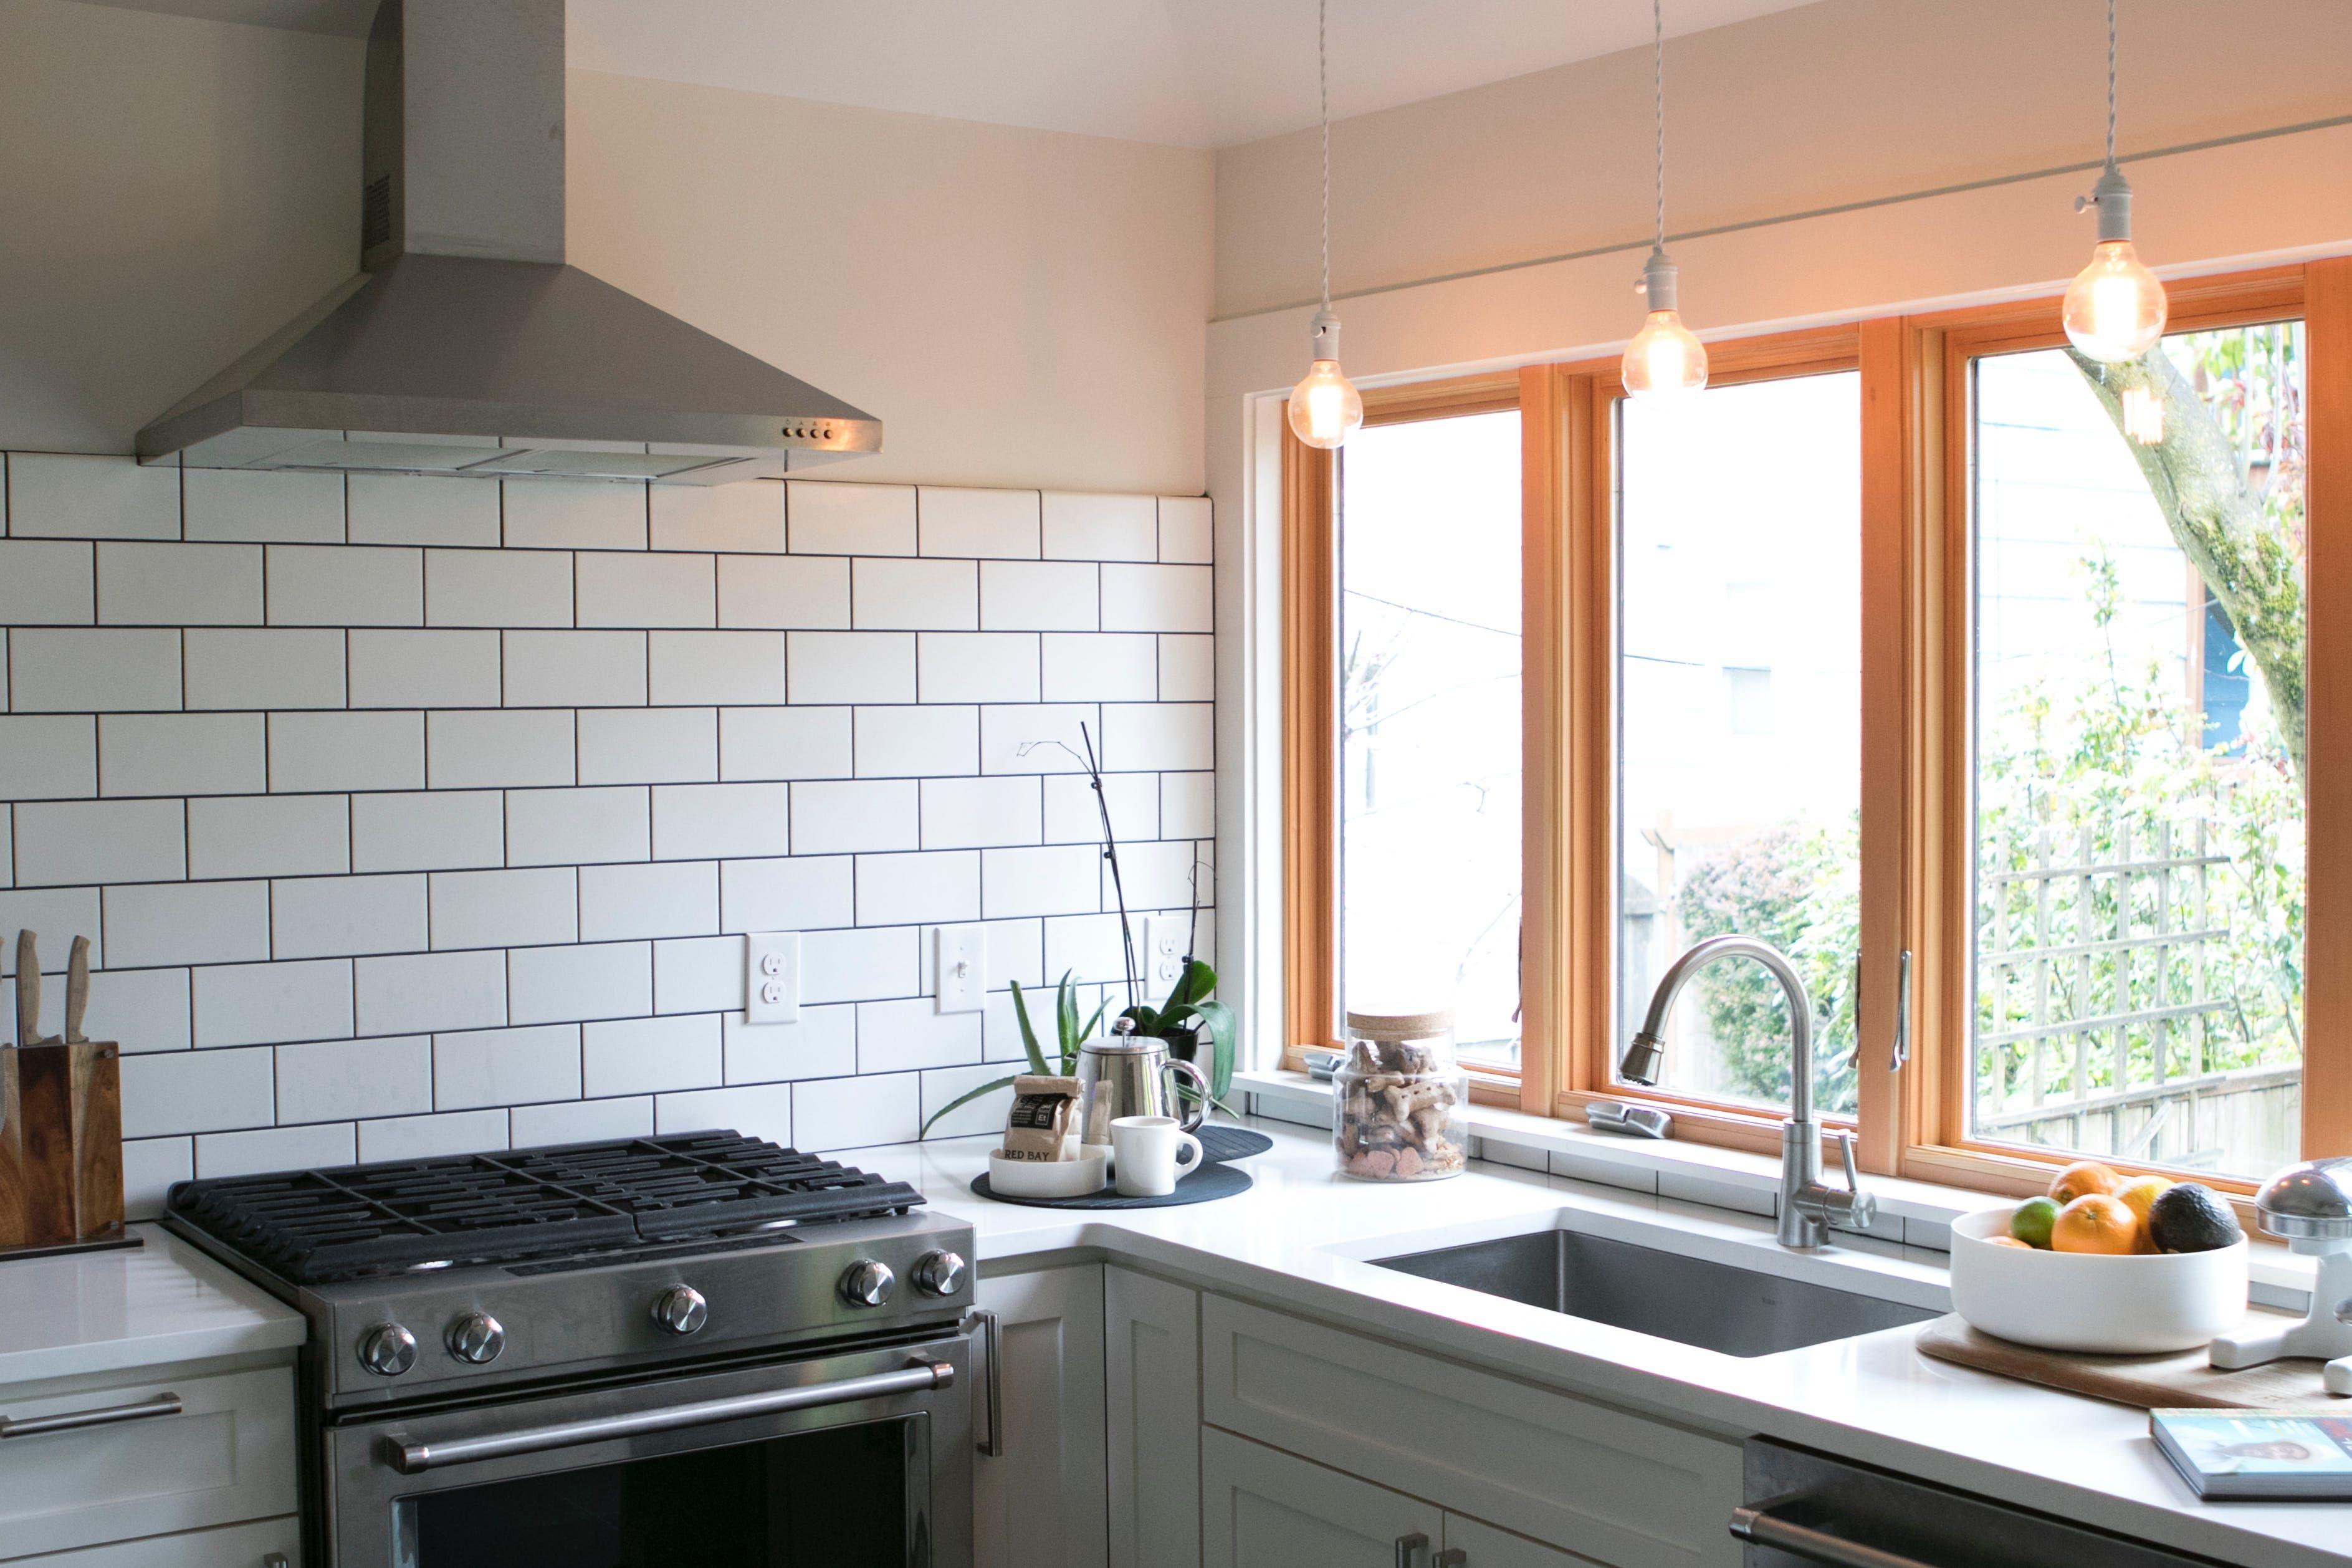 A Wonderful Remodeled Portland Home Embraces Wabi-Sabi   Cocinas